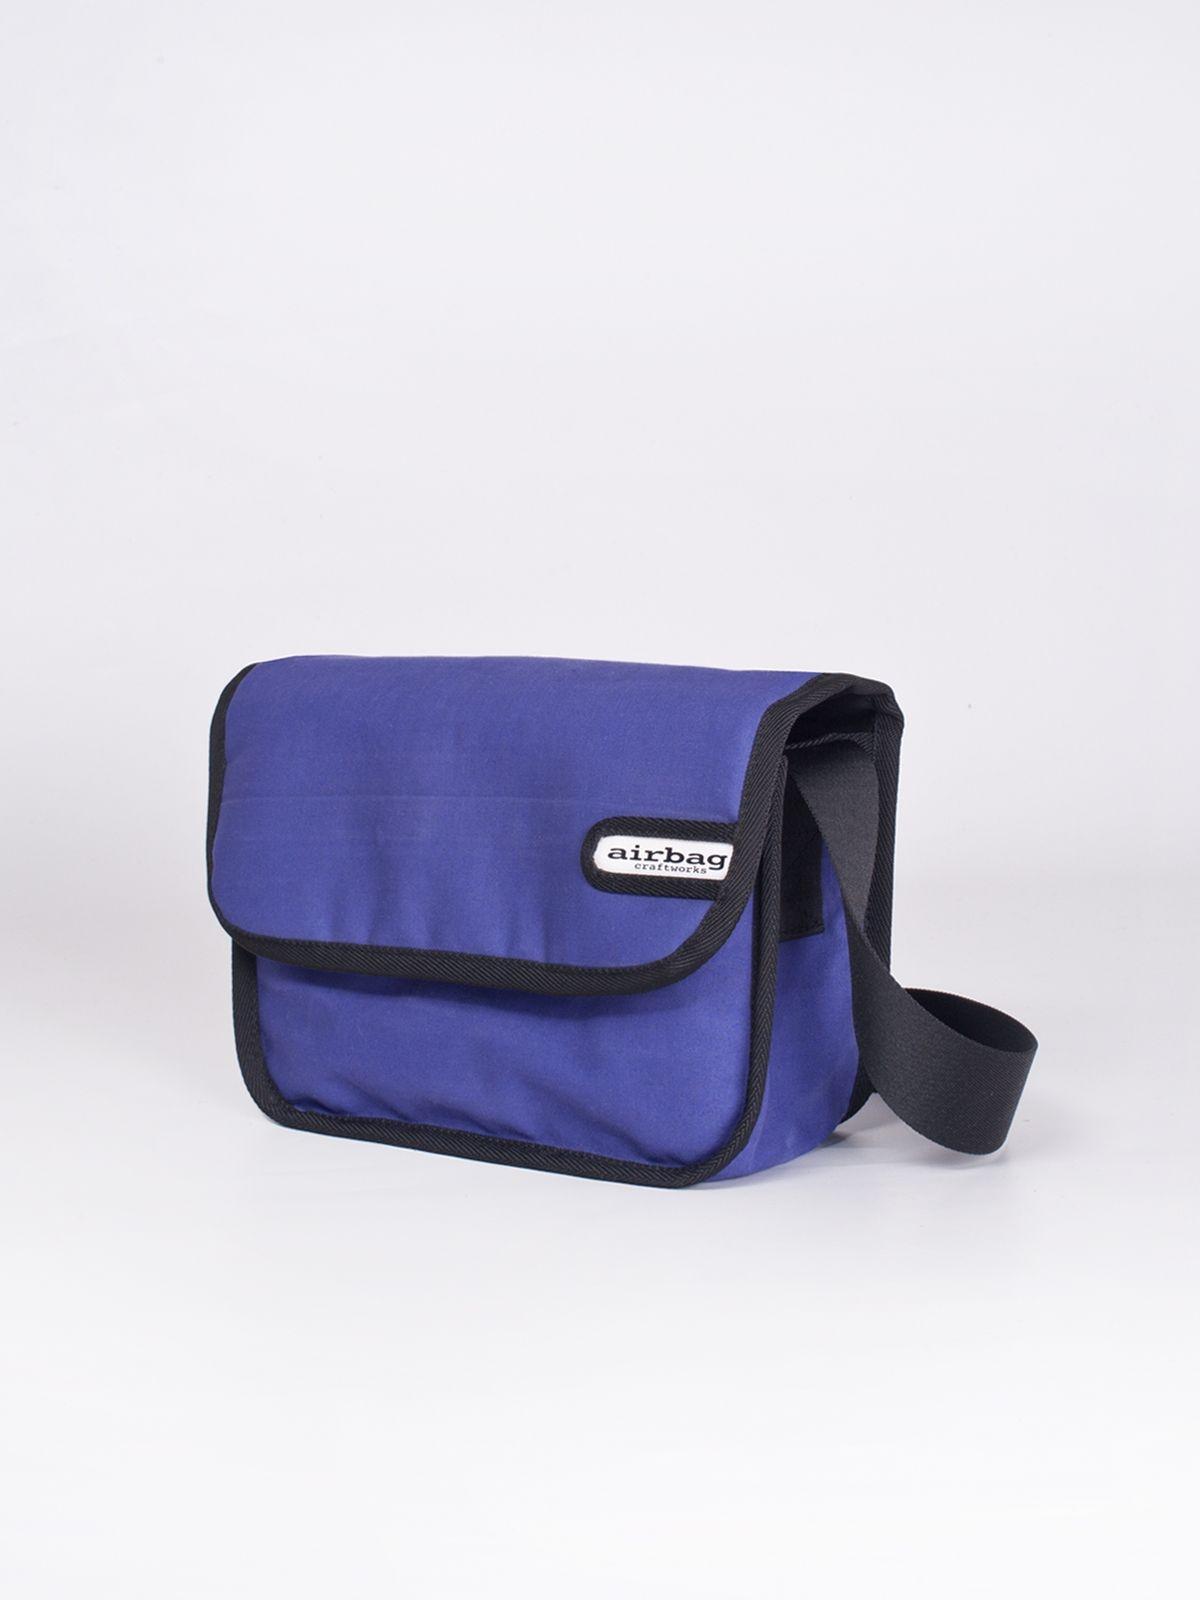 airbag craftworks 034